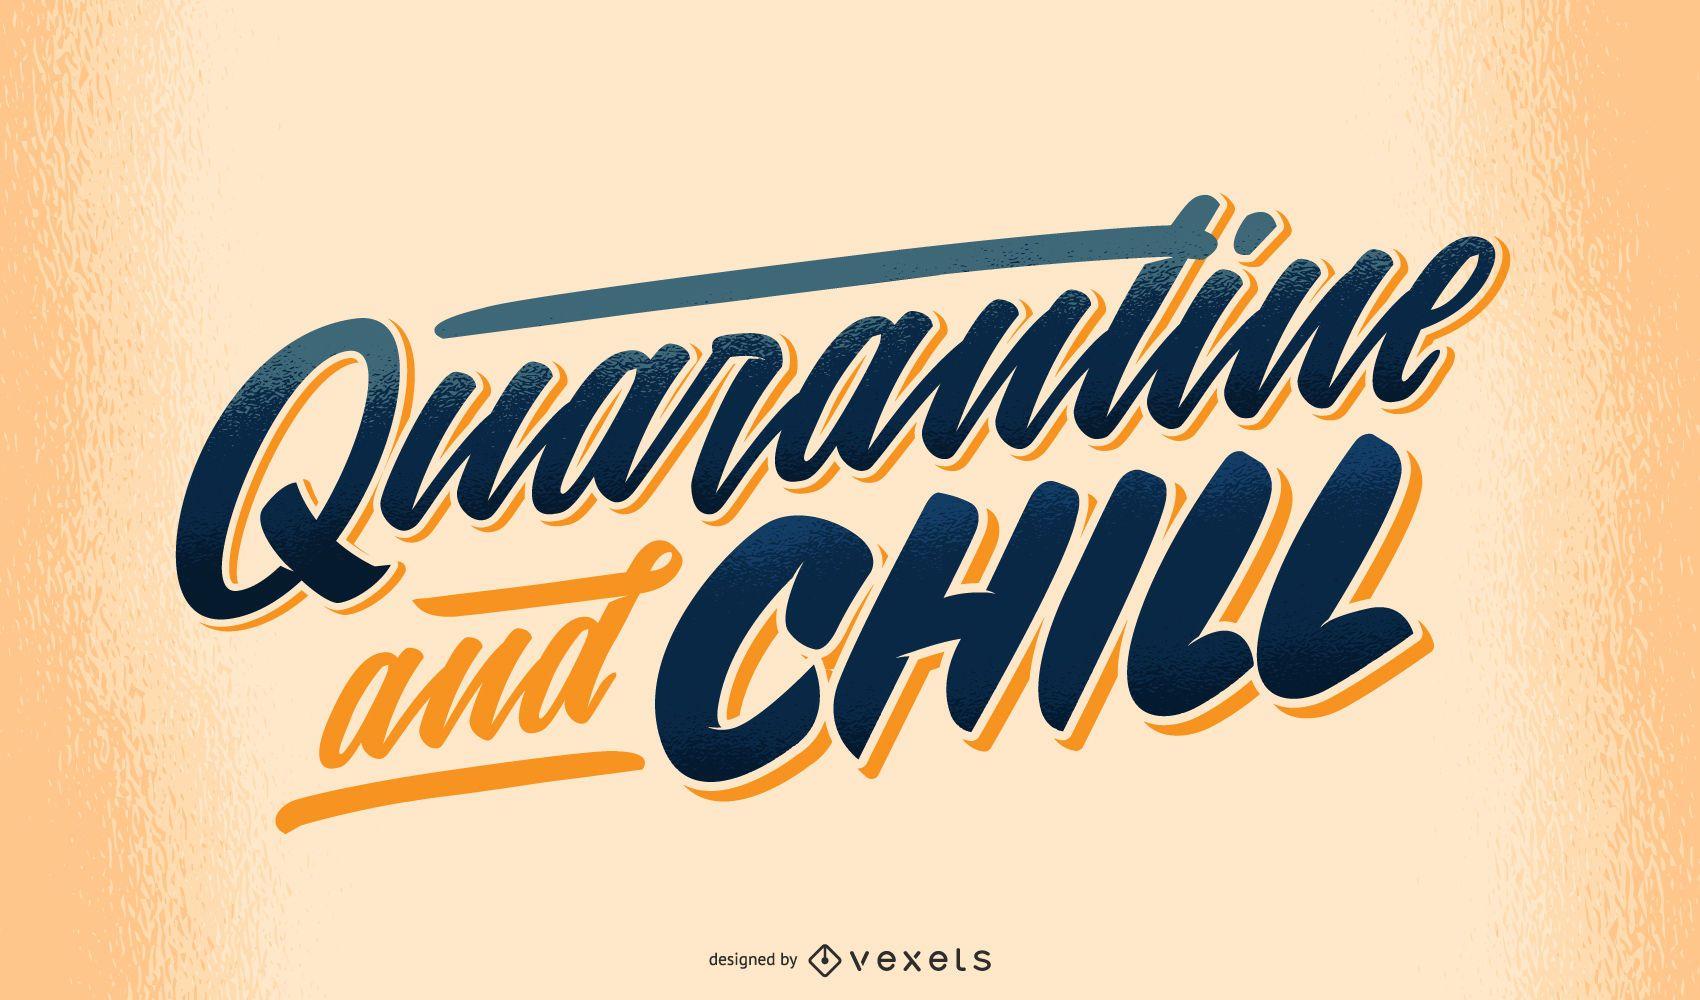 Quarantine and chill covid lettering